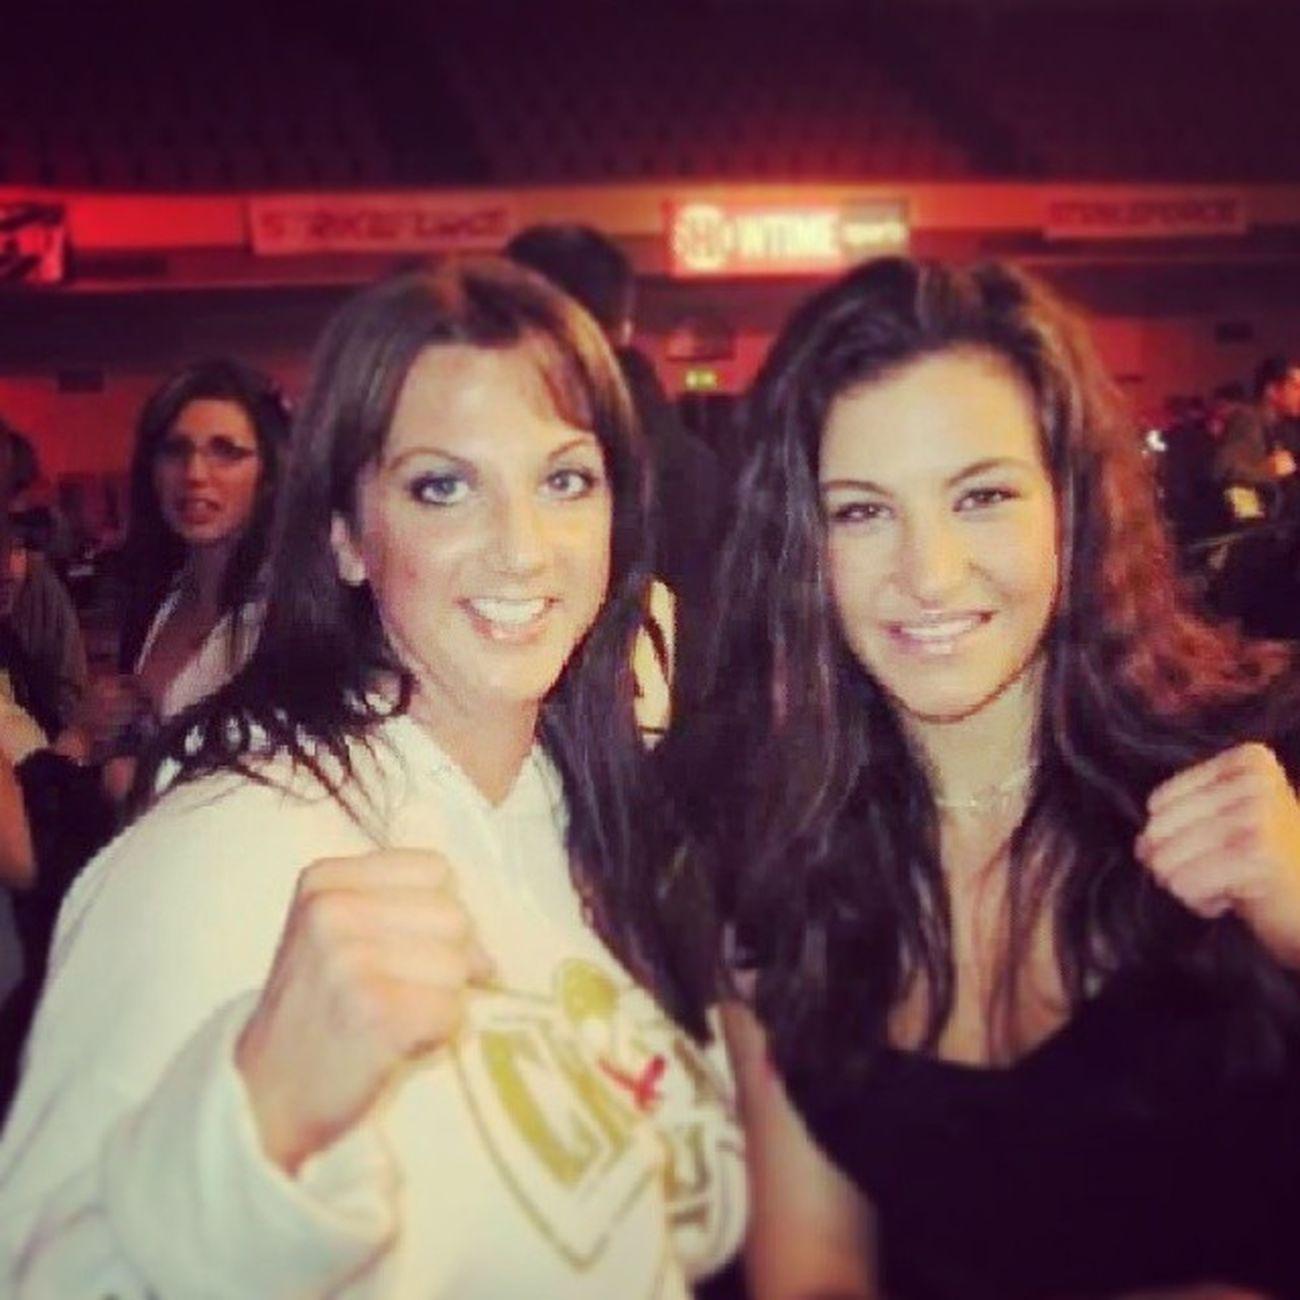 UFC168 MishaTate Chokeouttv Chokeoutcancer Strikeforce MMA UFC Fights Wrestling Womensmma